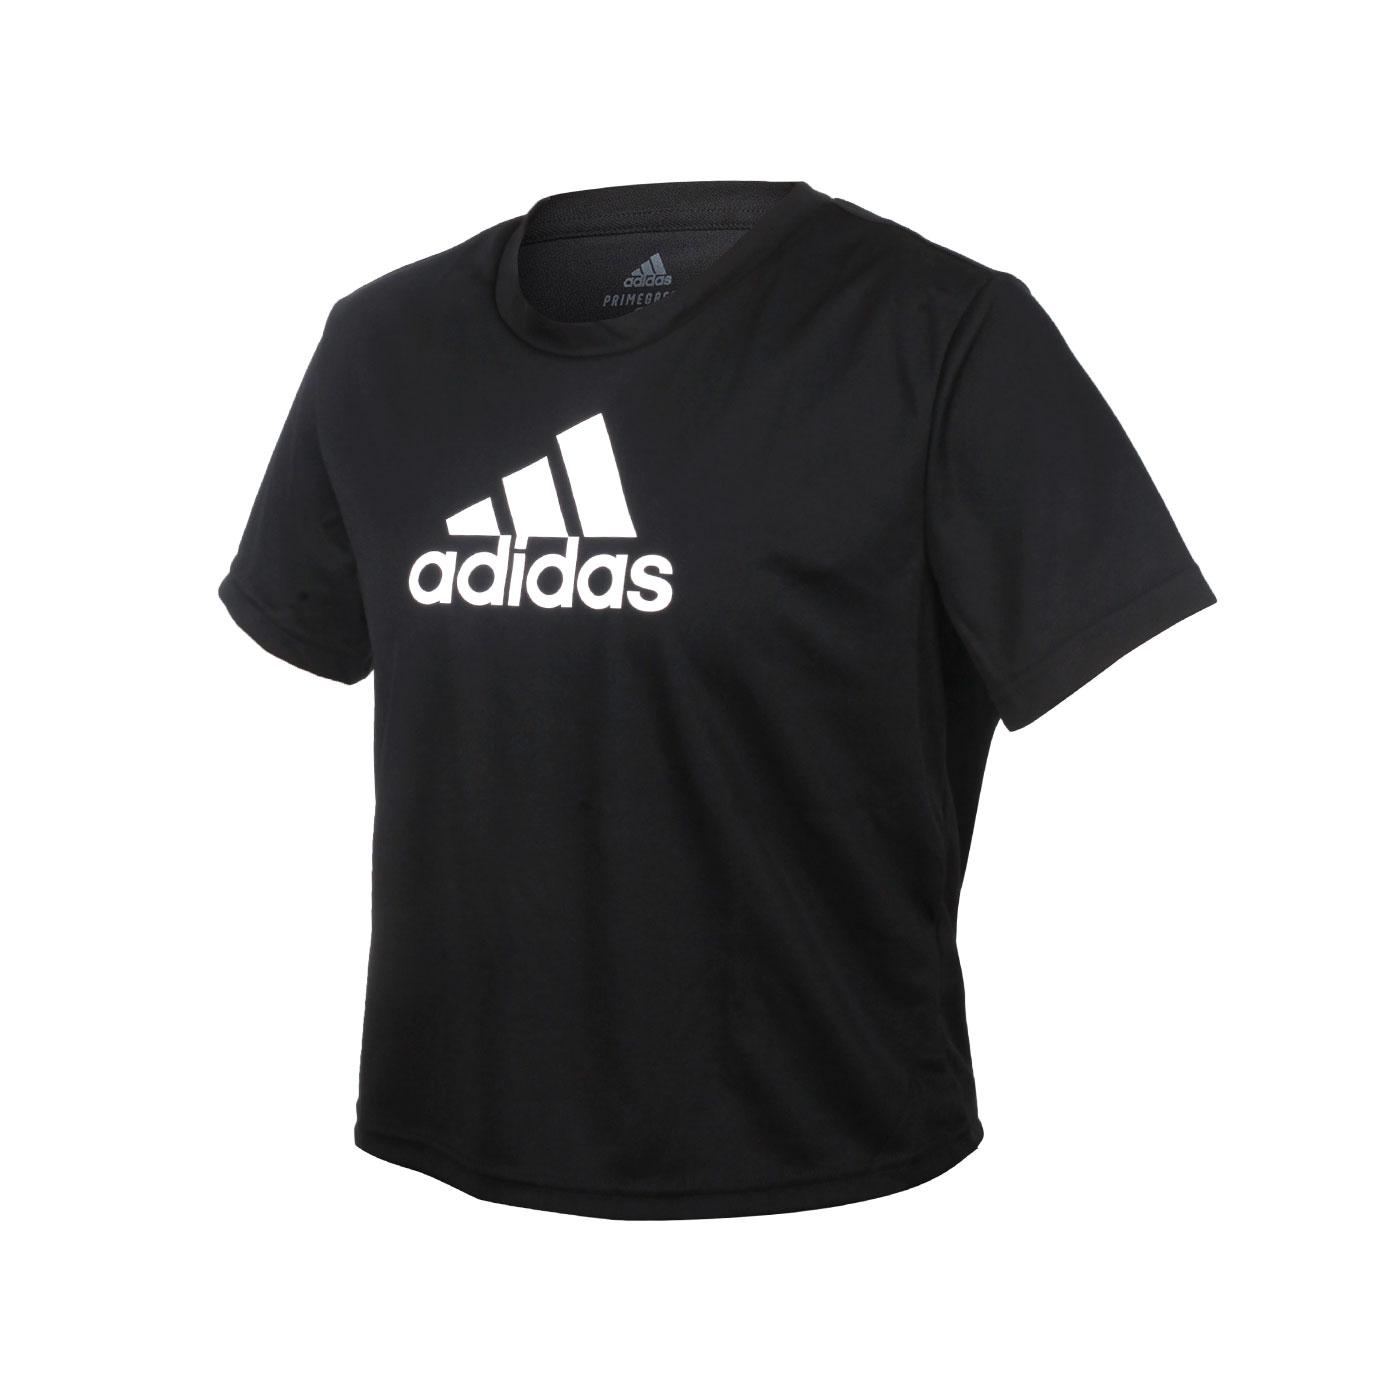 ADIDAS 女款短袖T恤 GL3830 - 黑白